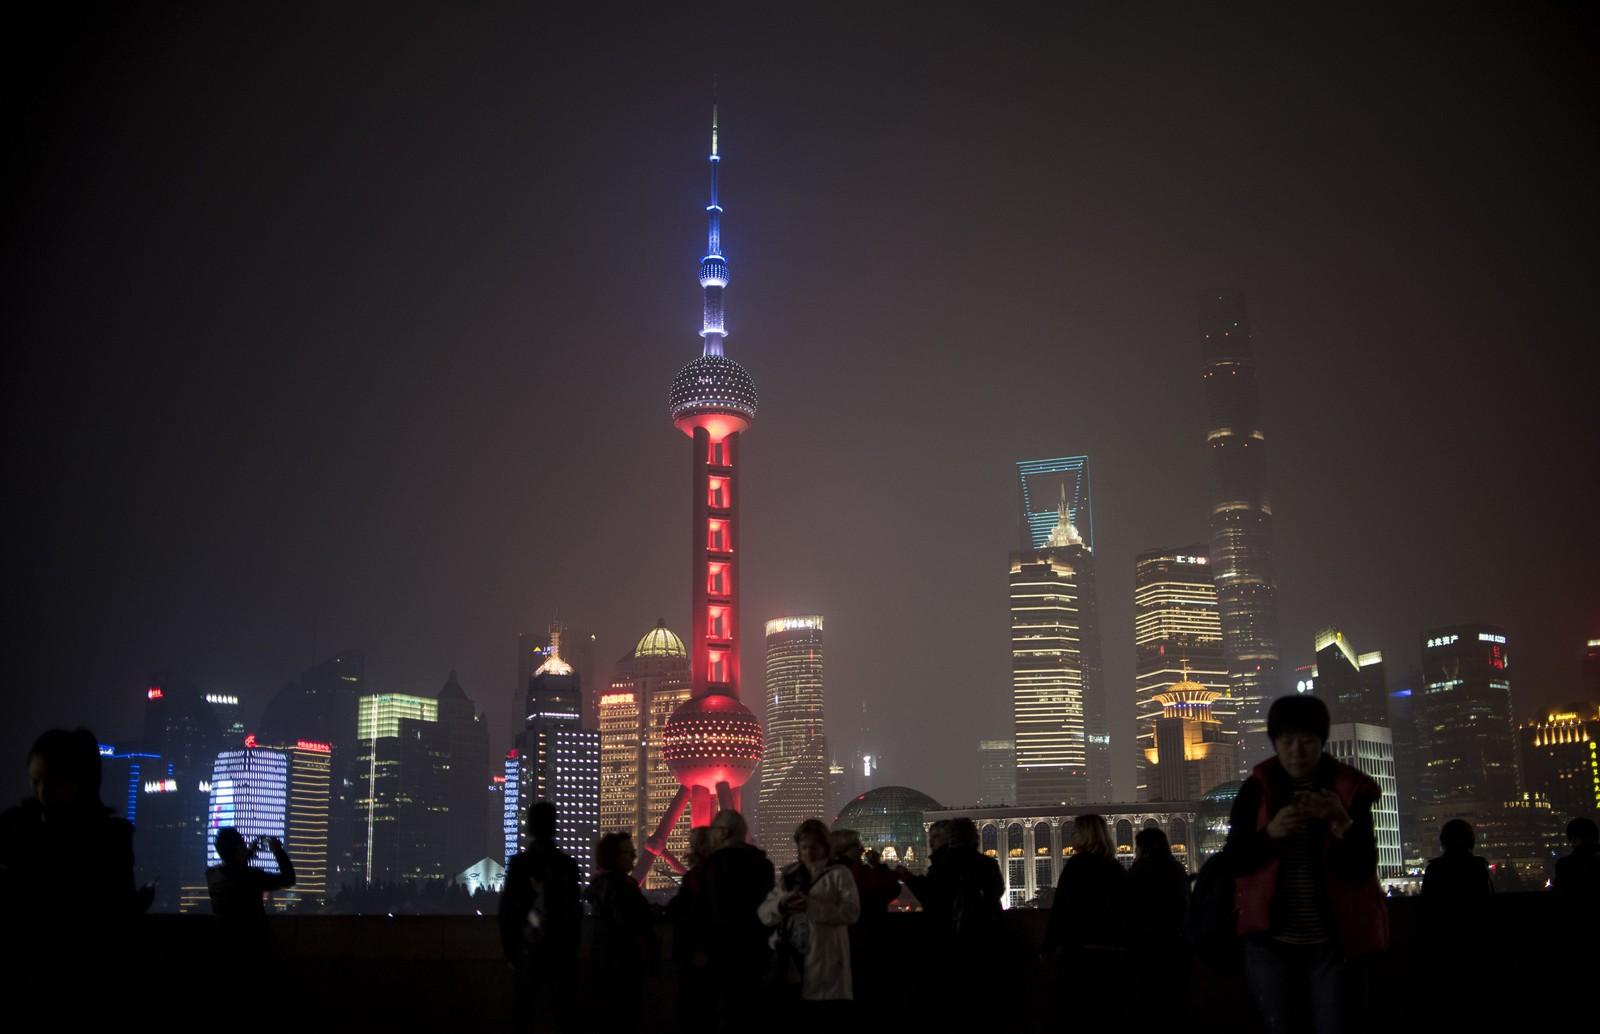 I Shanghai lyses TV-tårnet «the Oriental Pearl» opp i Frankrikes farger. TV-tårnet ligger i finansdistriktet Lujiazui i Pudong og symboliserer solidaritet.